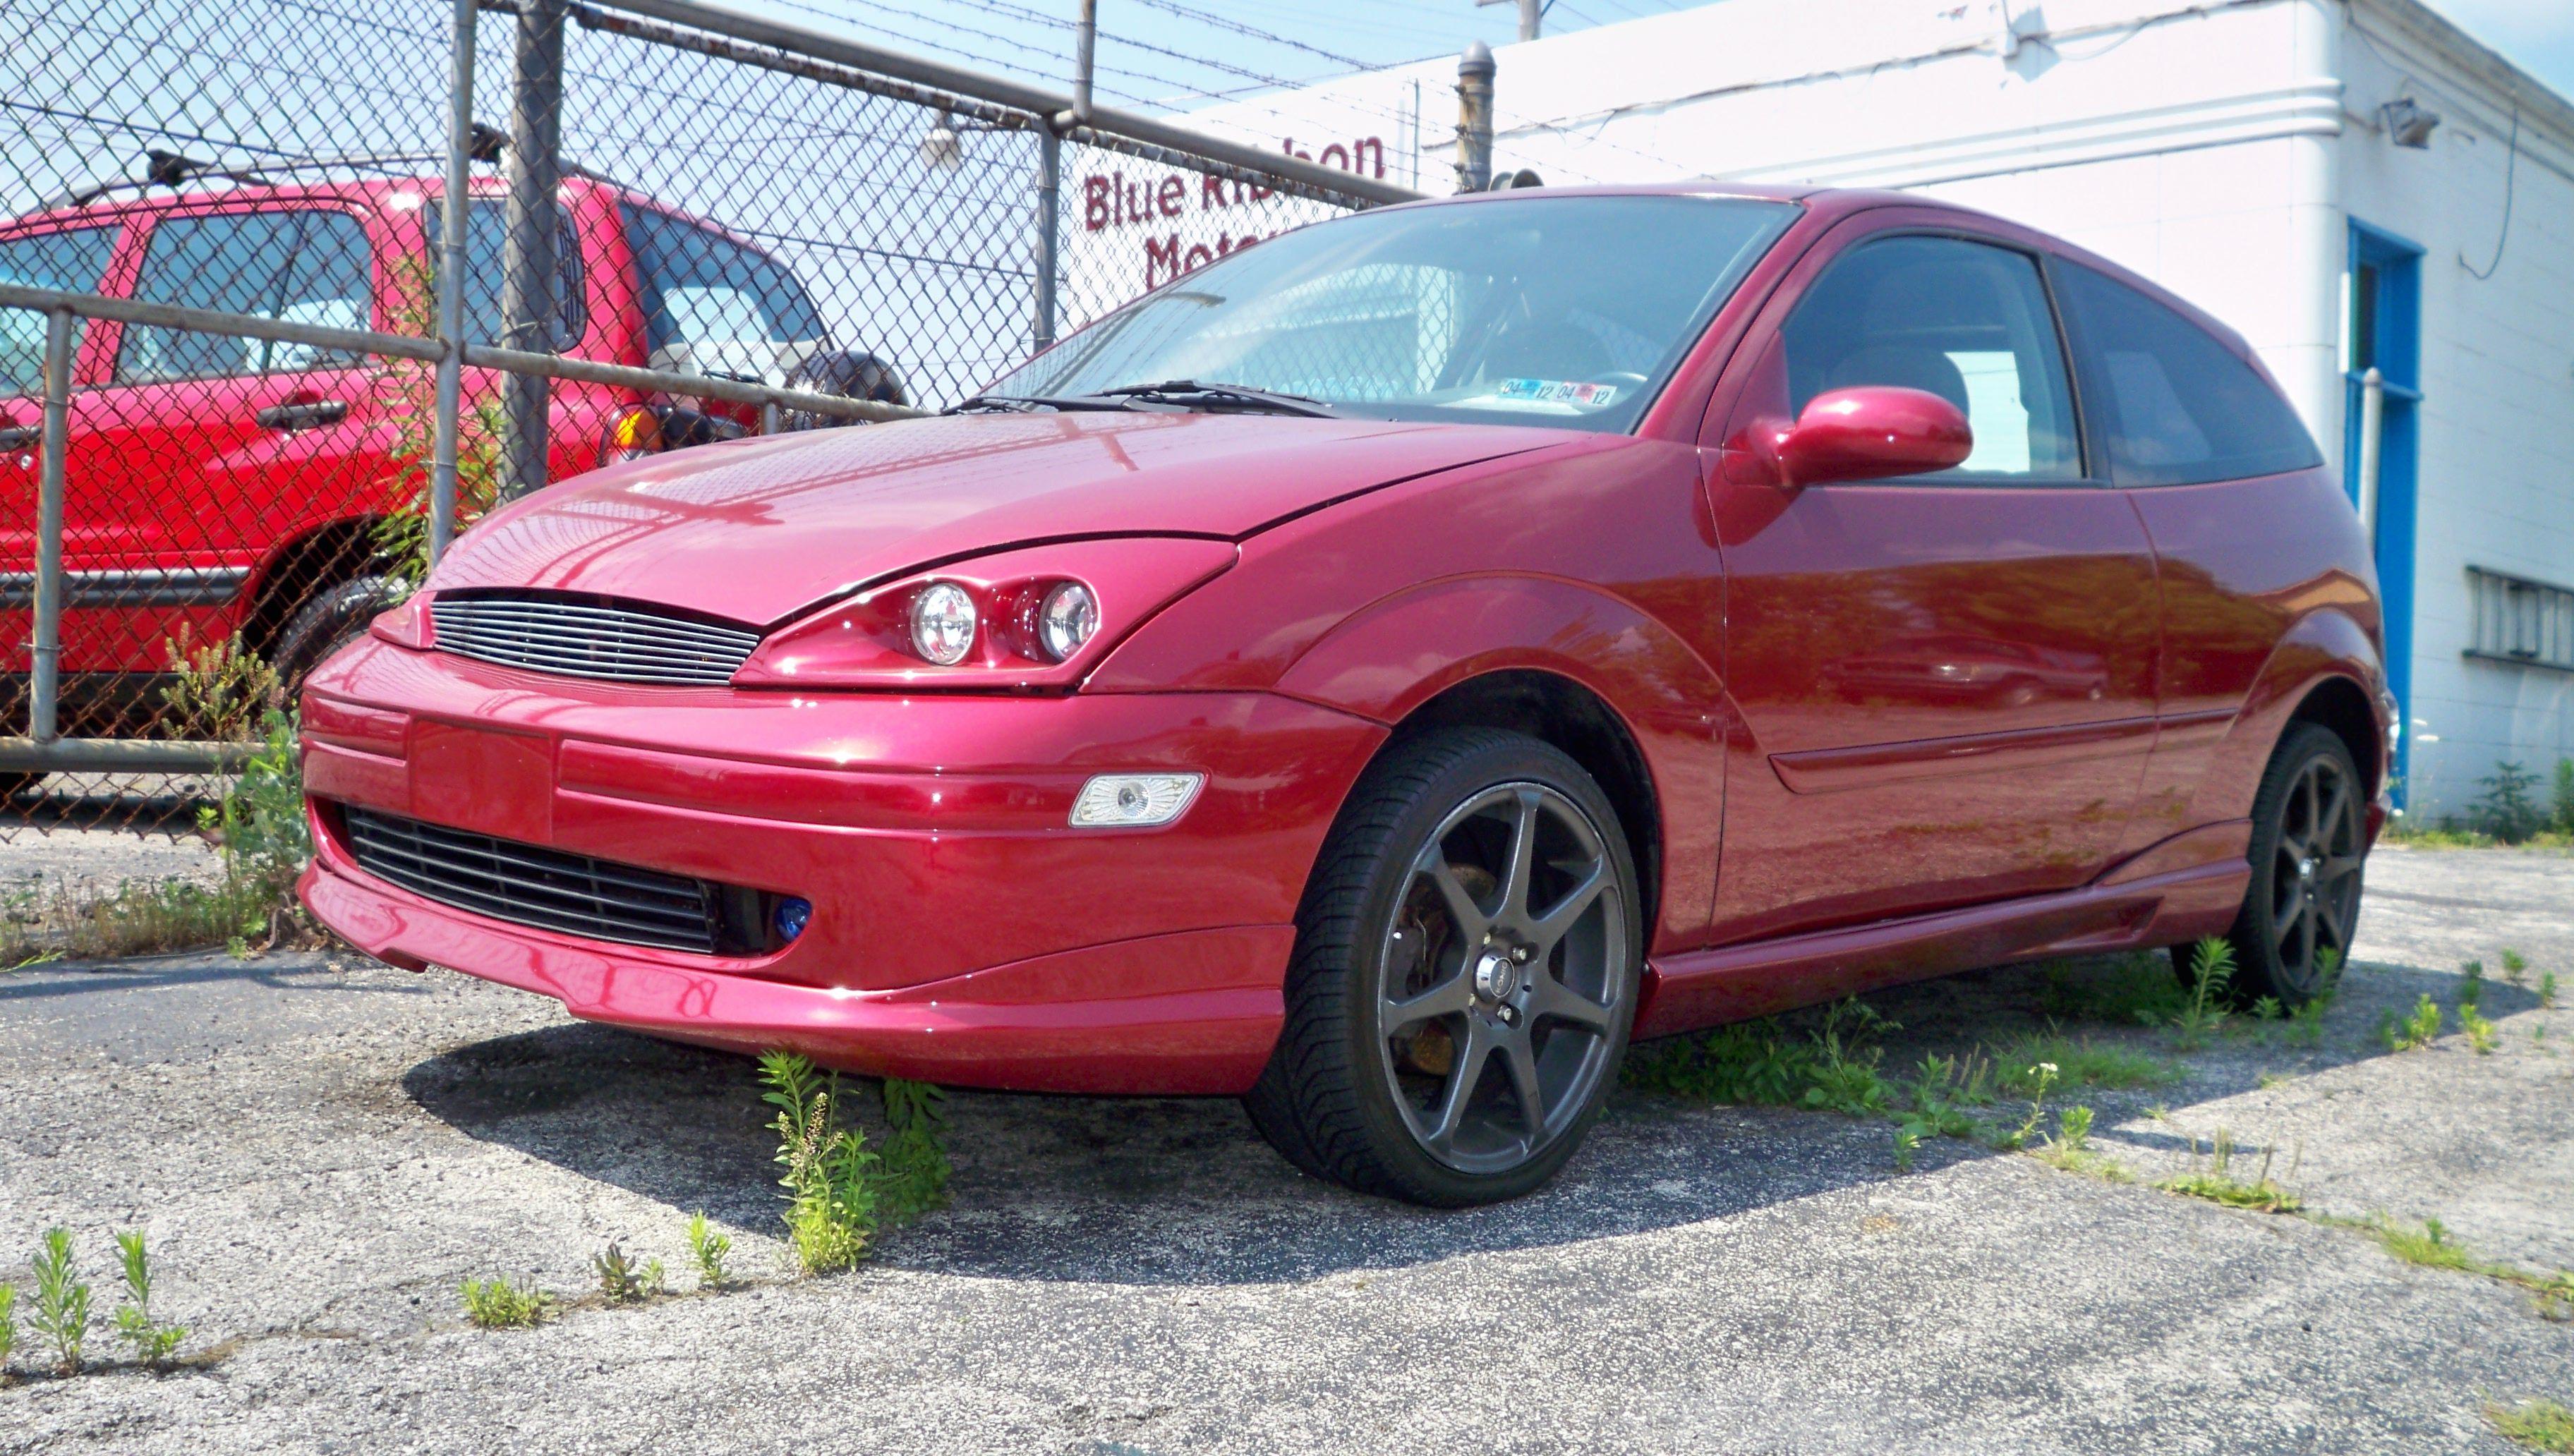 2001 Ford Focus Zx3 2 595 Blue Ribbon Motors 1 888 458 9923